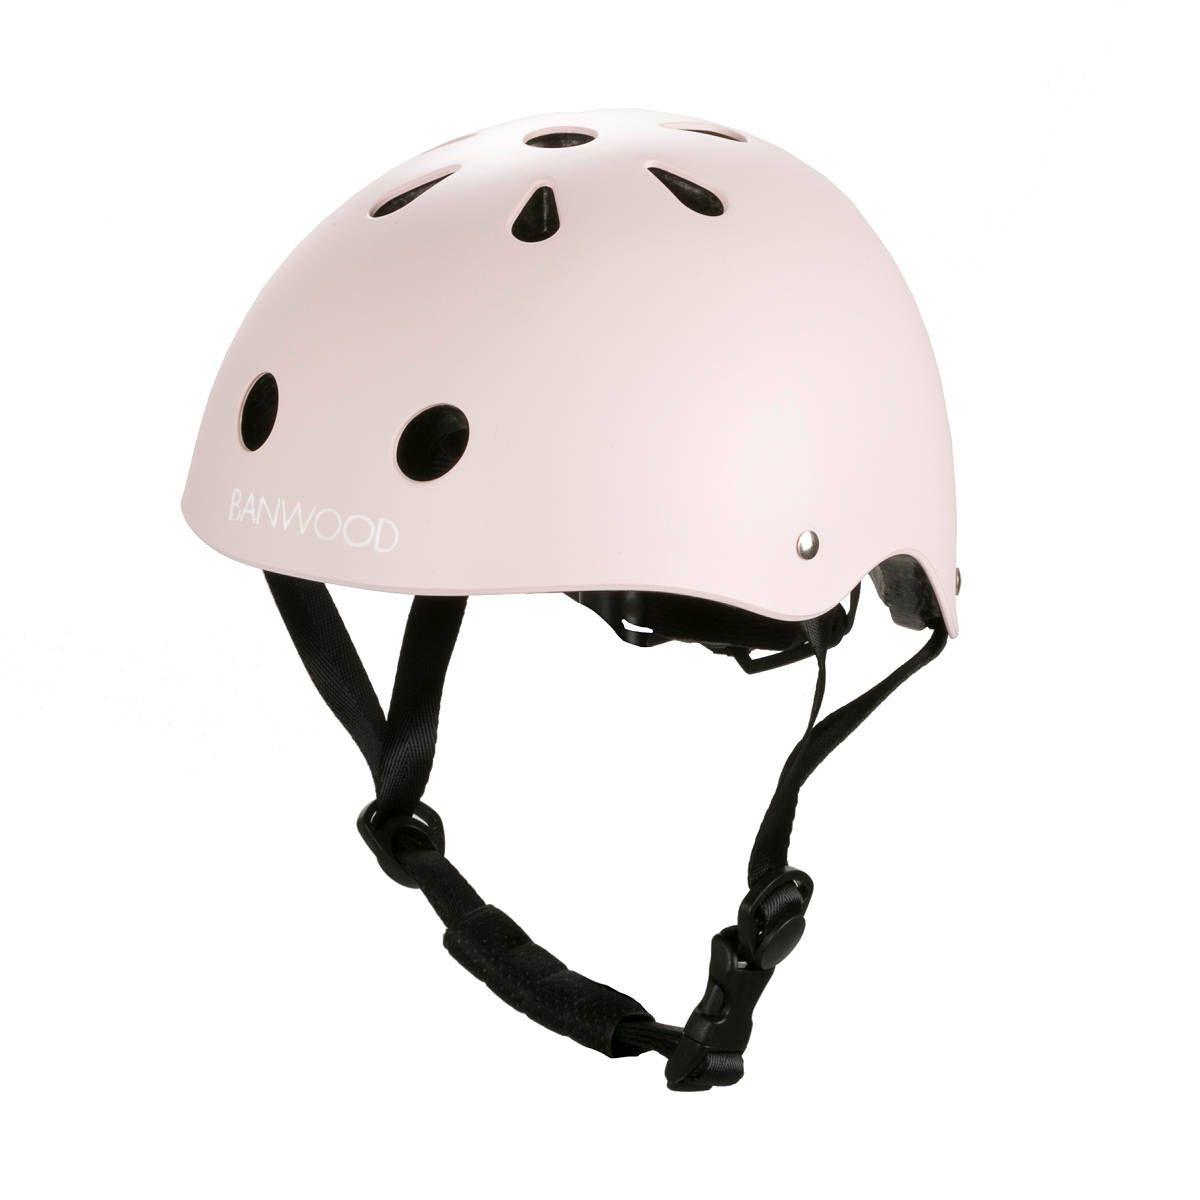 Kids Bike Helmet Urban Skate Helmet For Skateboards BMX and Stunt Scooter Cycle